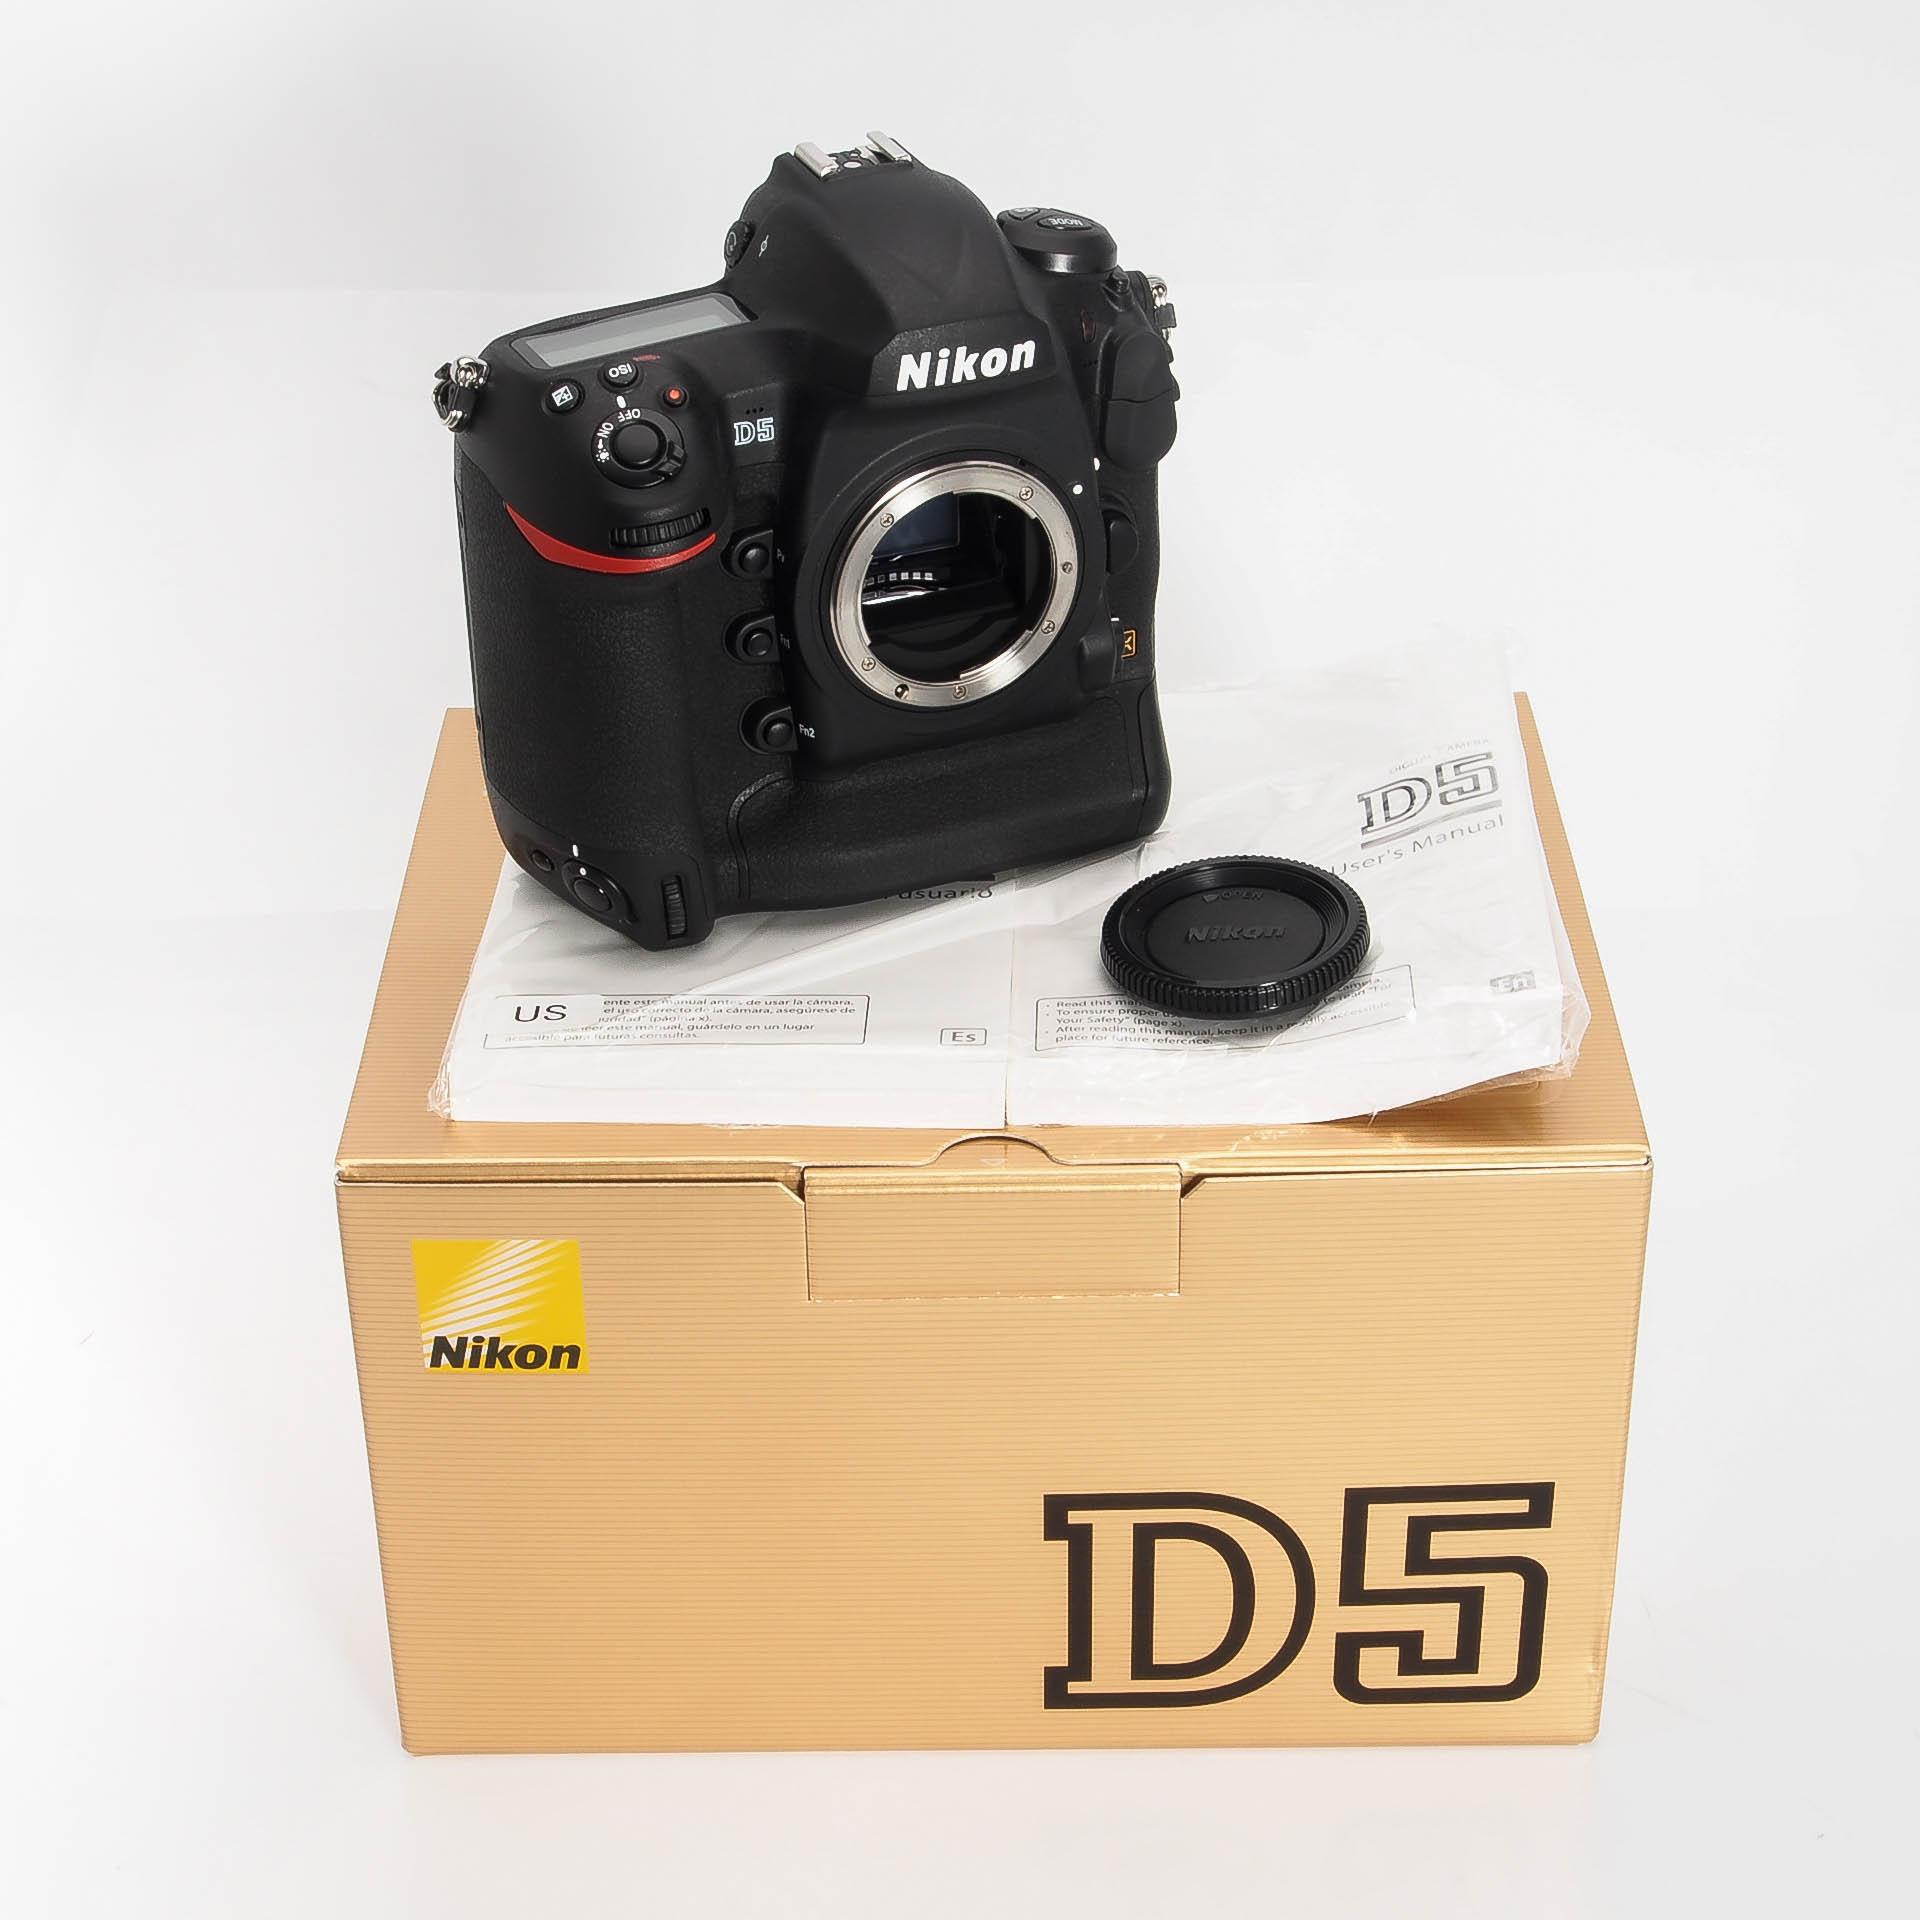 Digital Cameras & Camcorders - National Camera Exchange